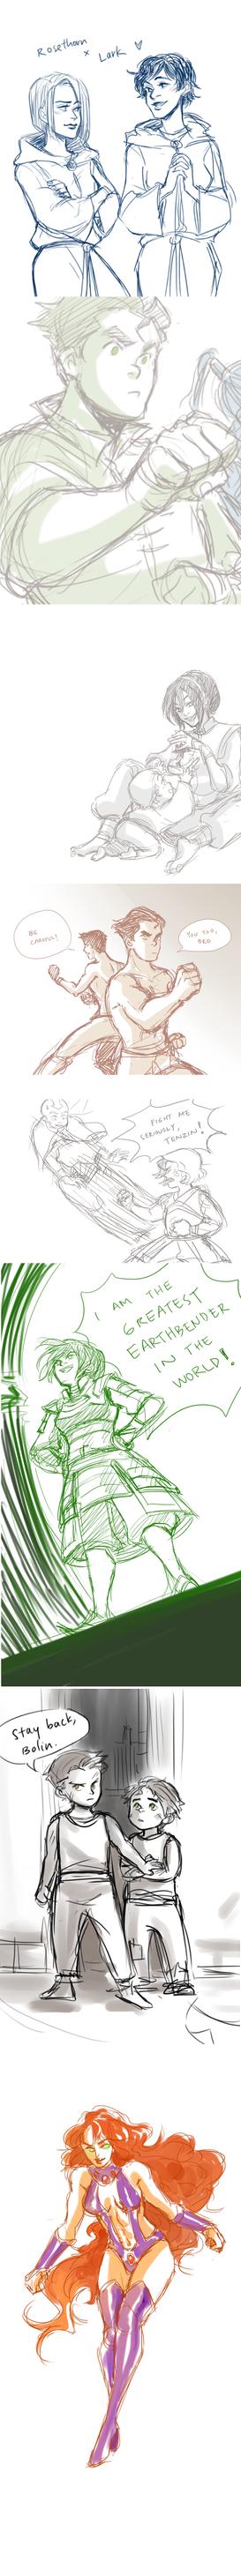 sketch dump: TP+Korra+DC by Minuiko